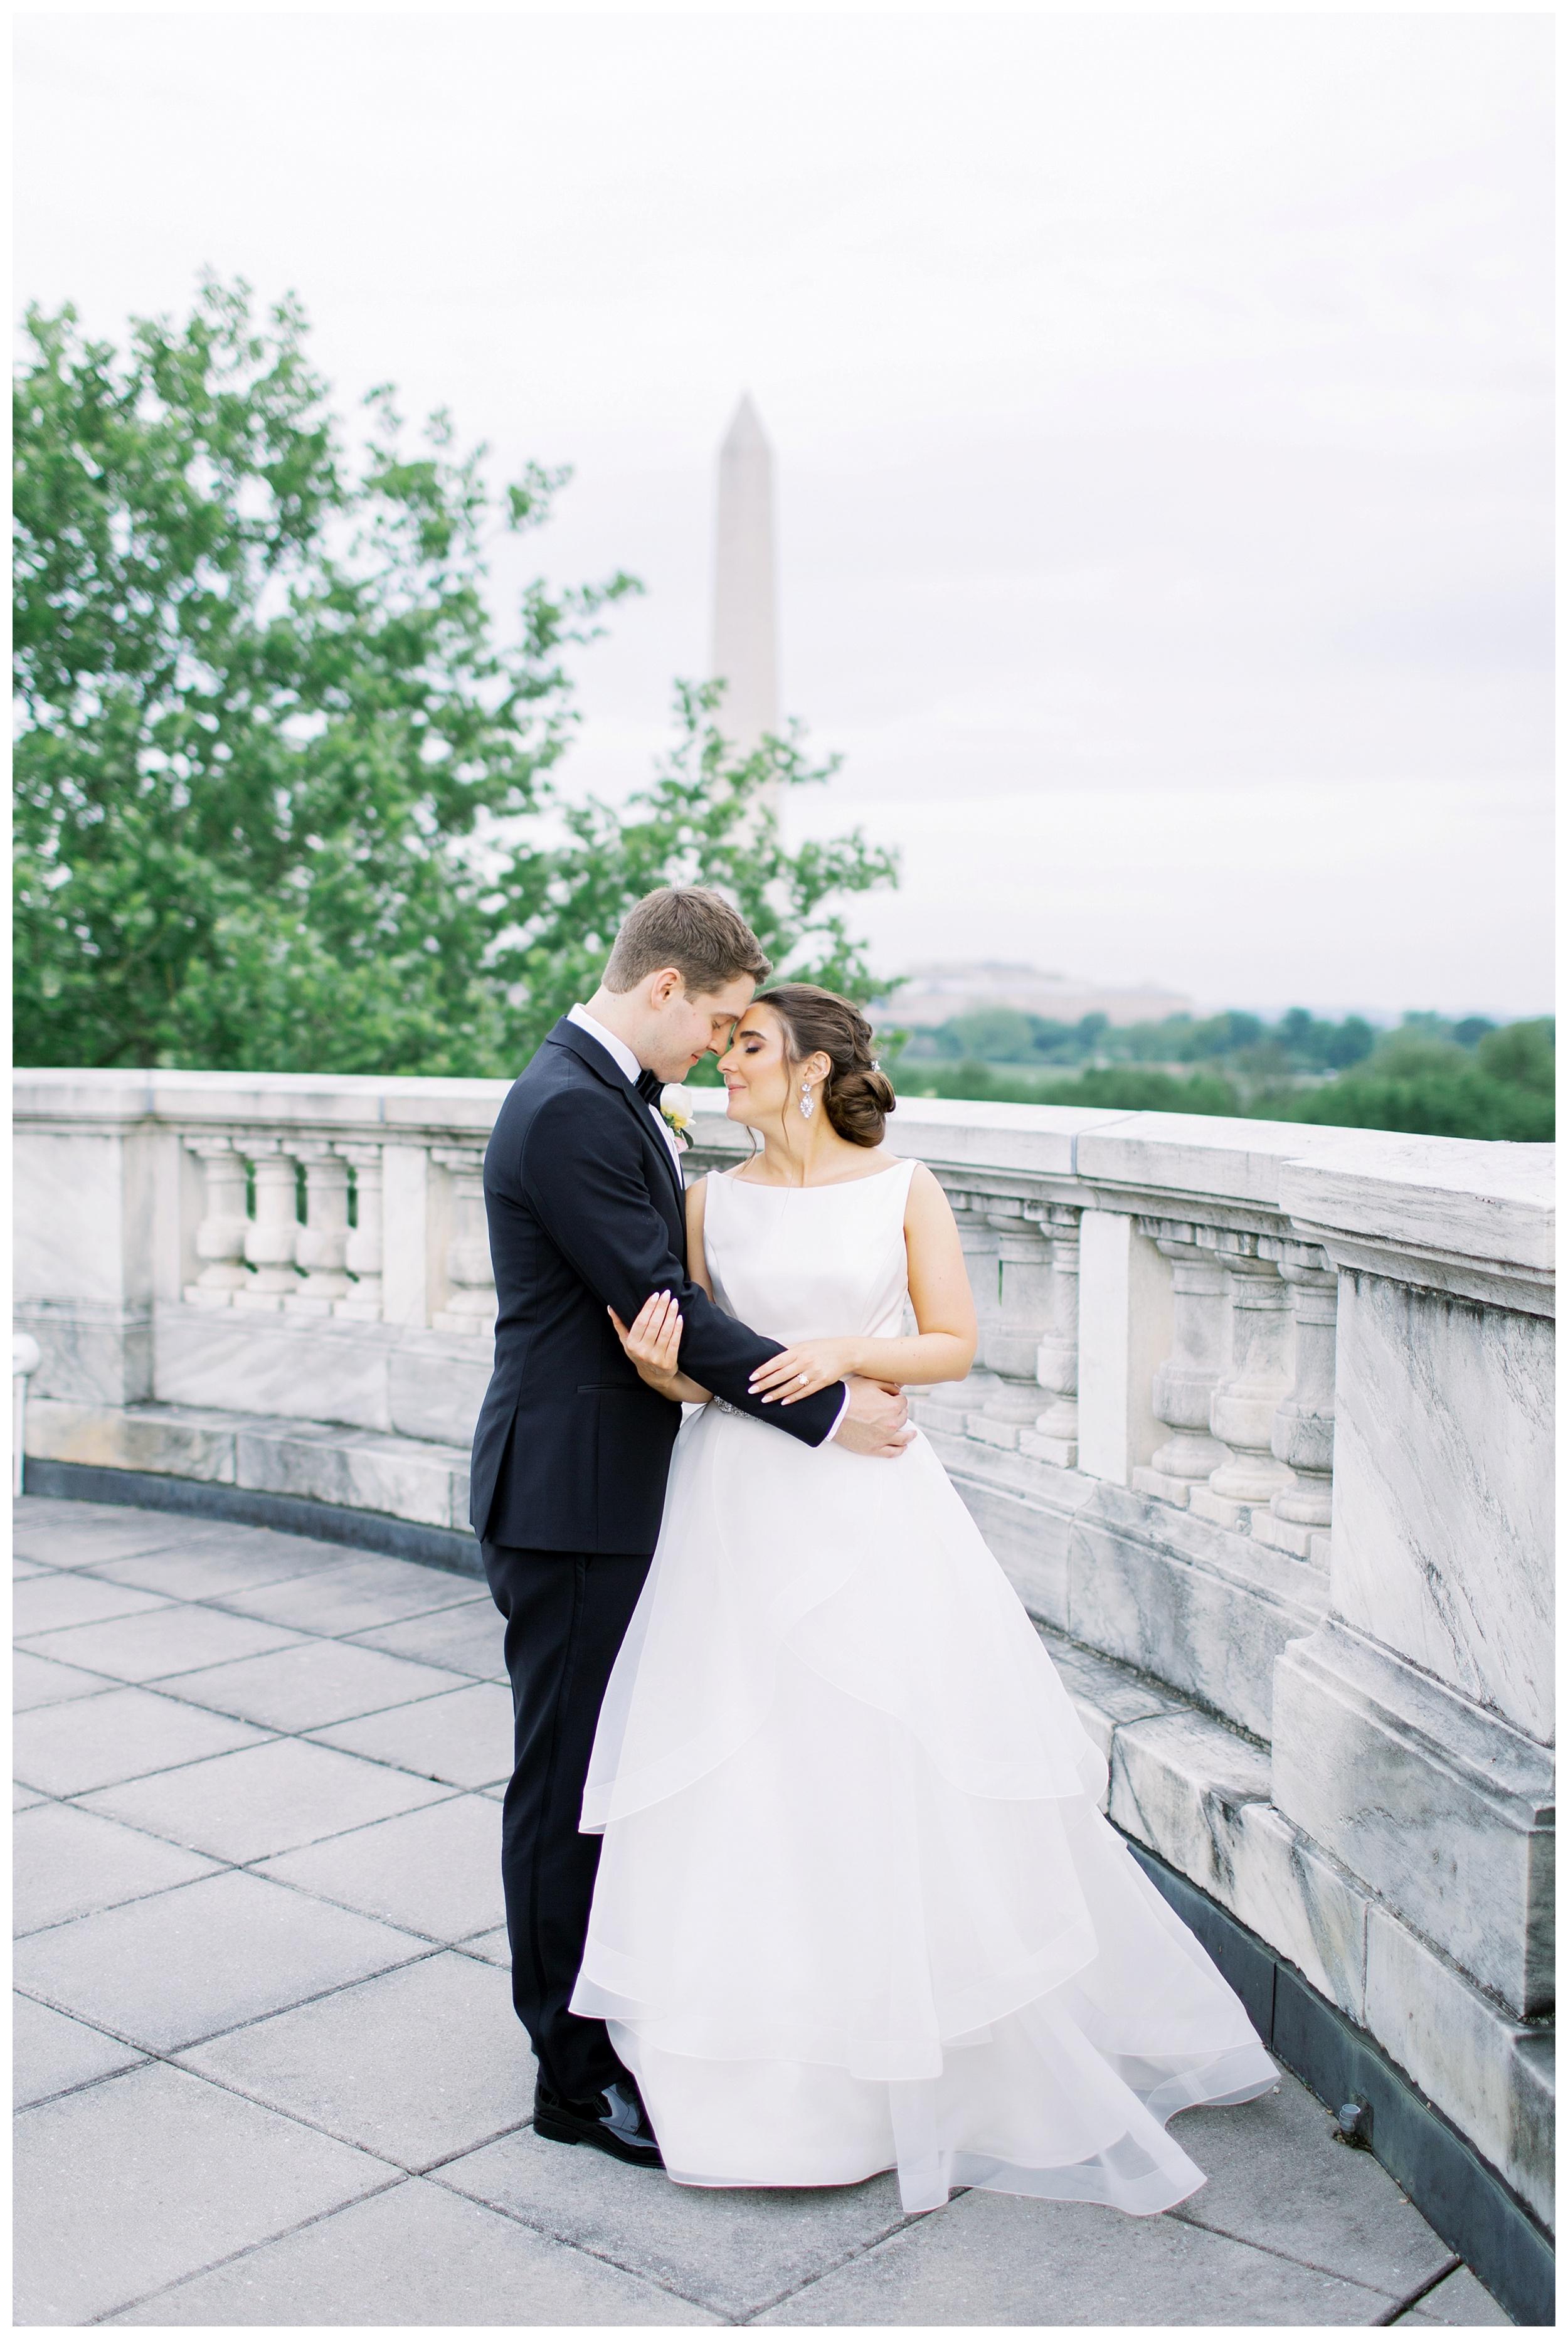 DAR Constitution Hall Wedding Wedding | Daughters of the American Revolution Wedding | District of Columbia Film Wedding Photographer Kir Tuben_0113.jpg